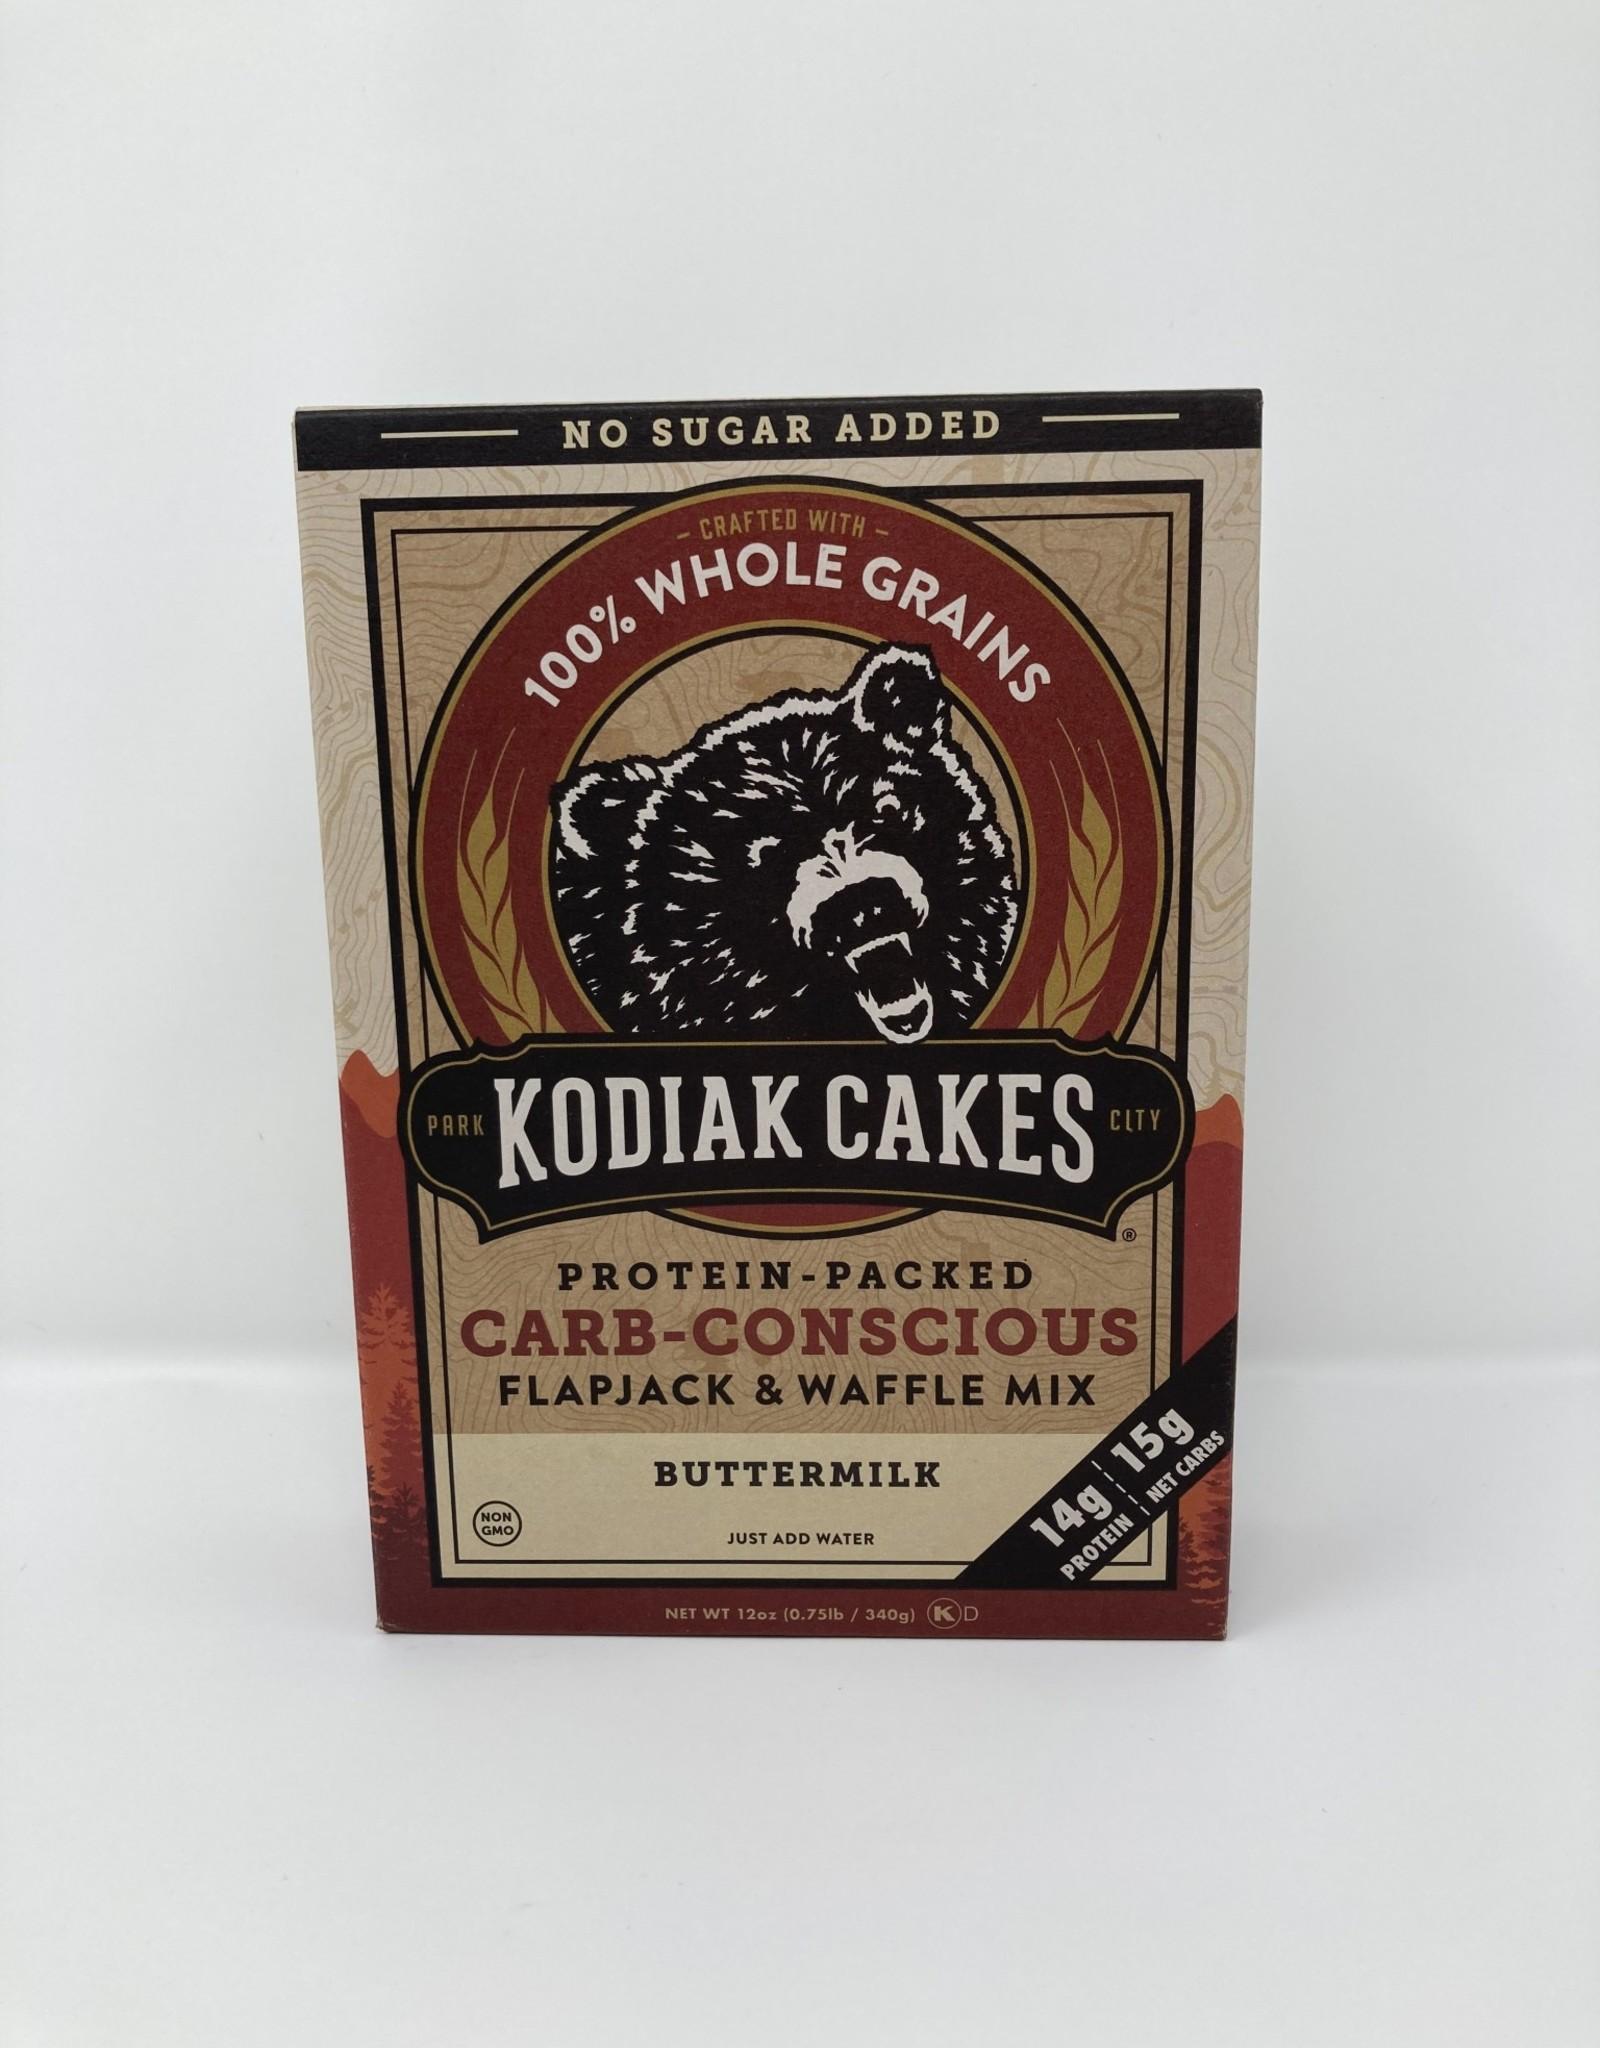 Kodiak Cakes Kodiak Cakes - Flapjack & Waffle Mix, Carb-Concious (340g)